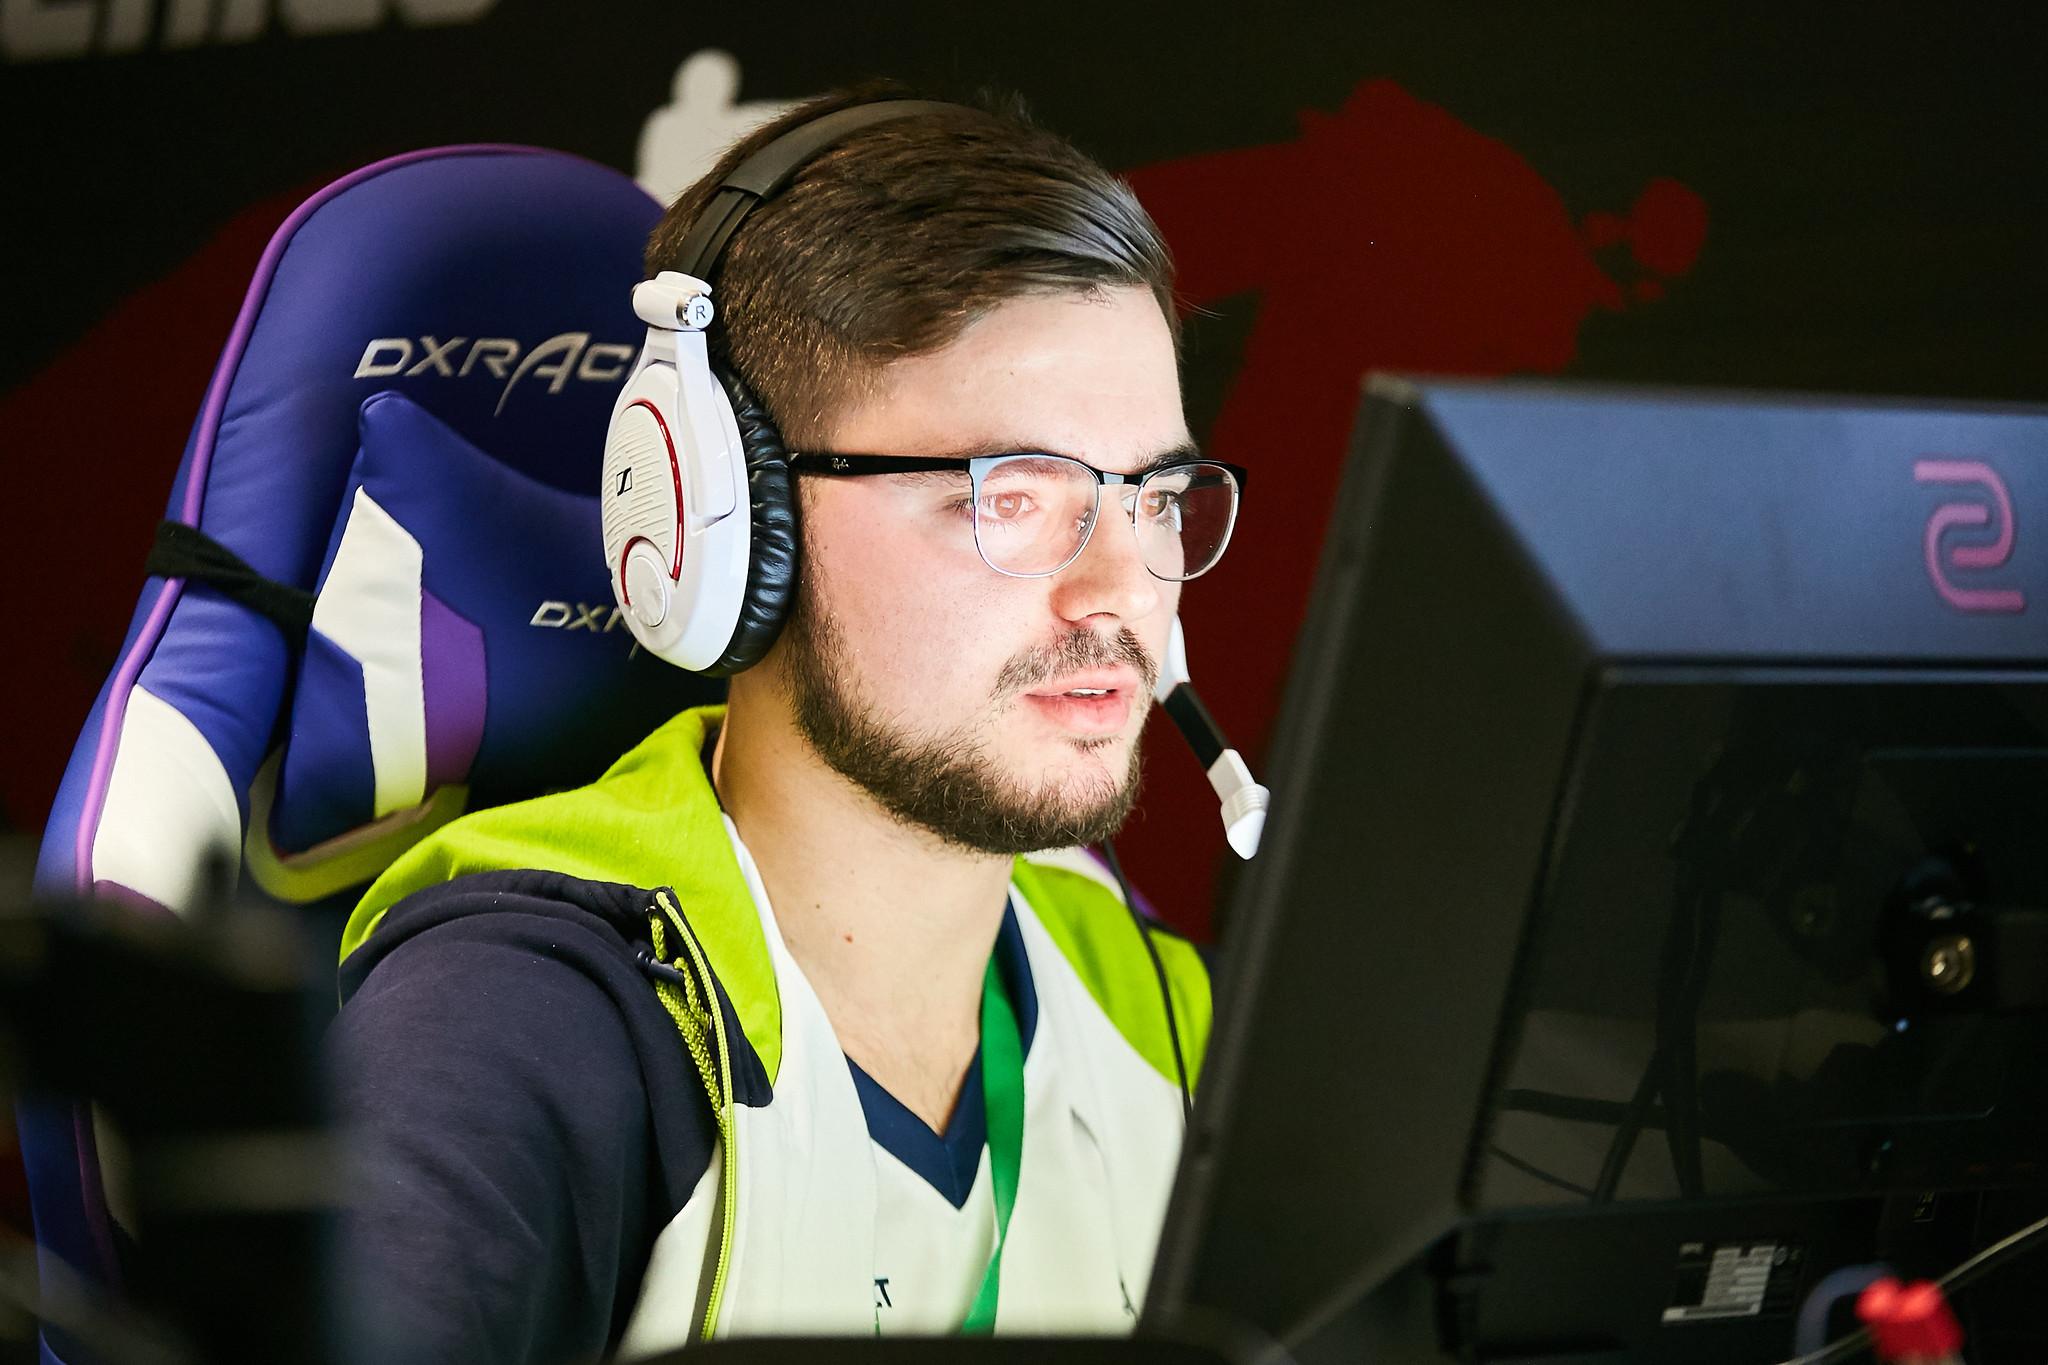 CIS Minor Championship - Berlin 2019 team list complete